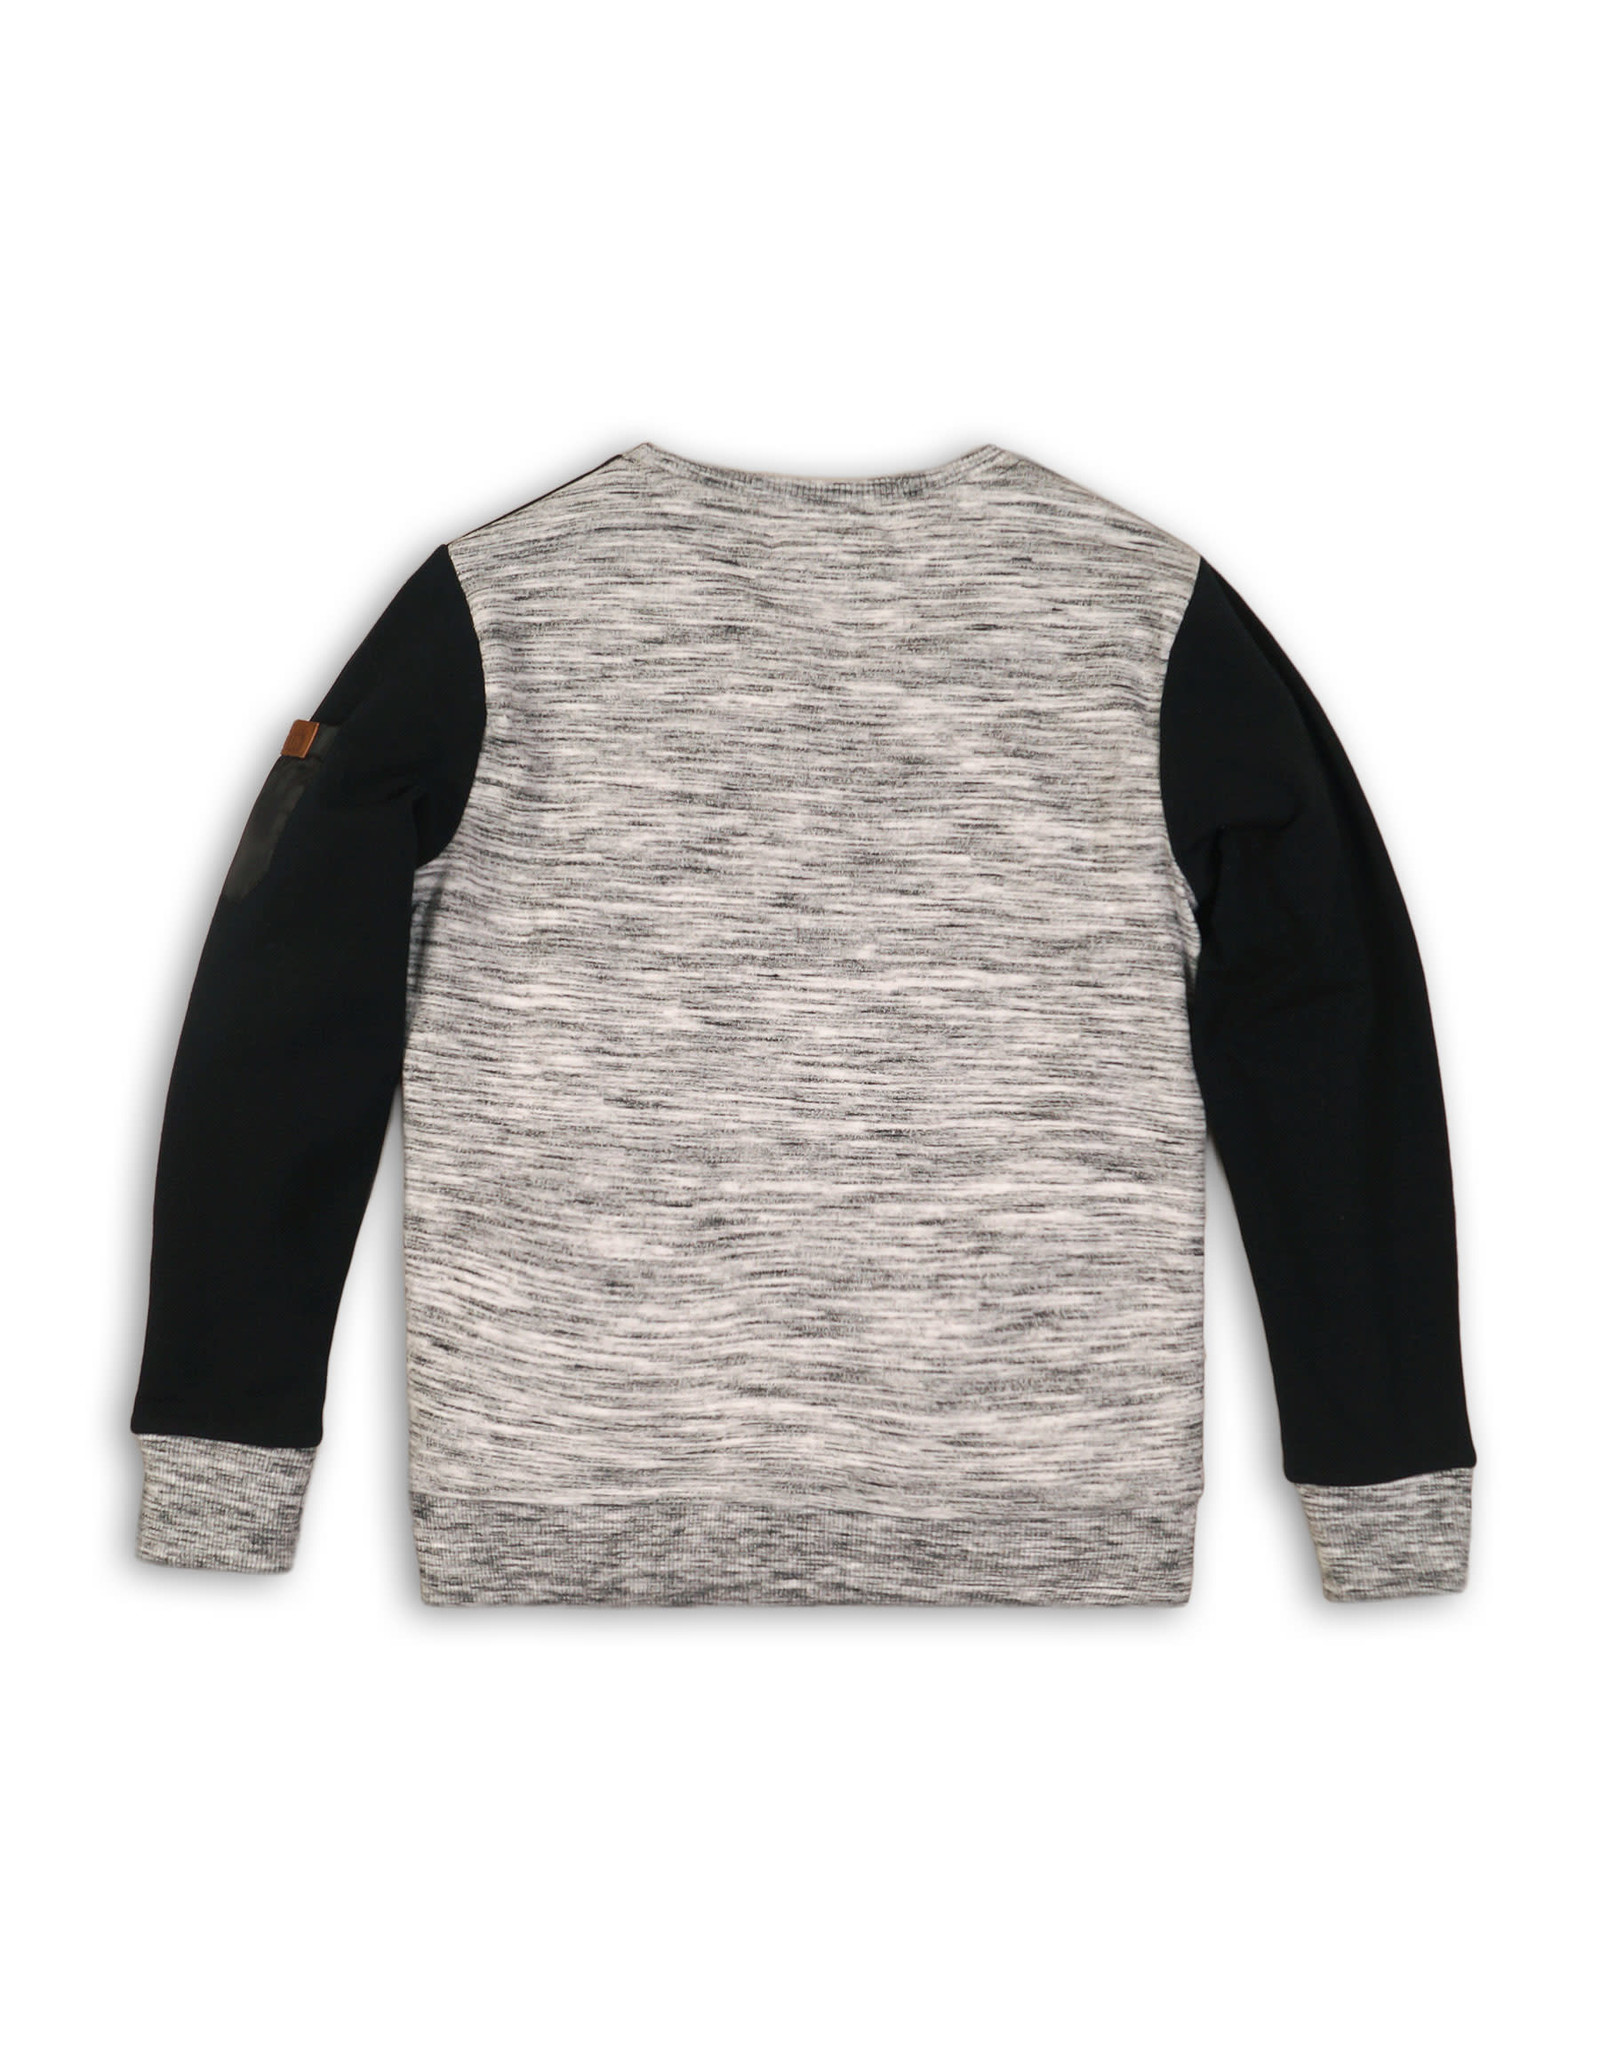 DJ Dutchjeans DJ Dutchjeans jongens block sweater DANGEROUS